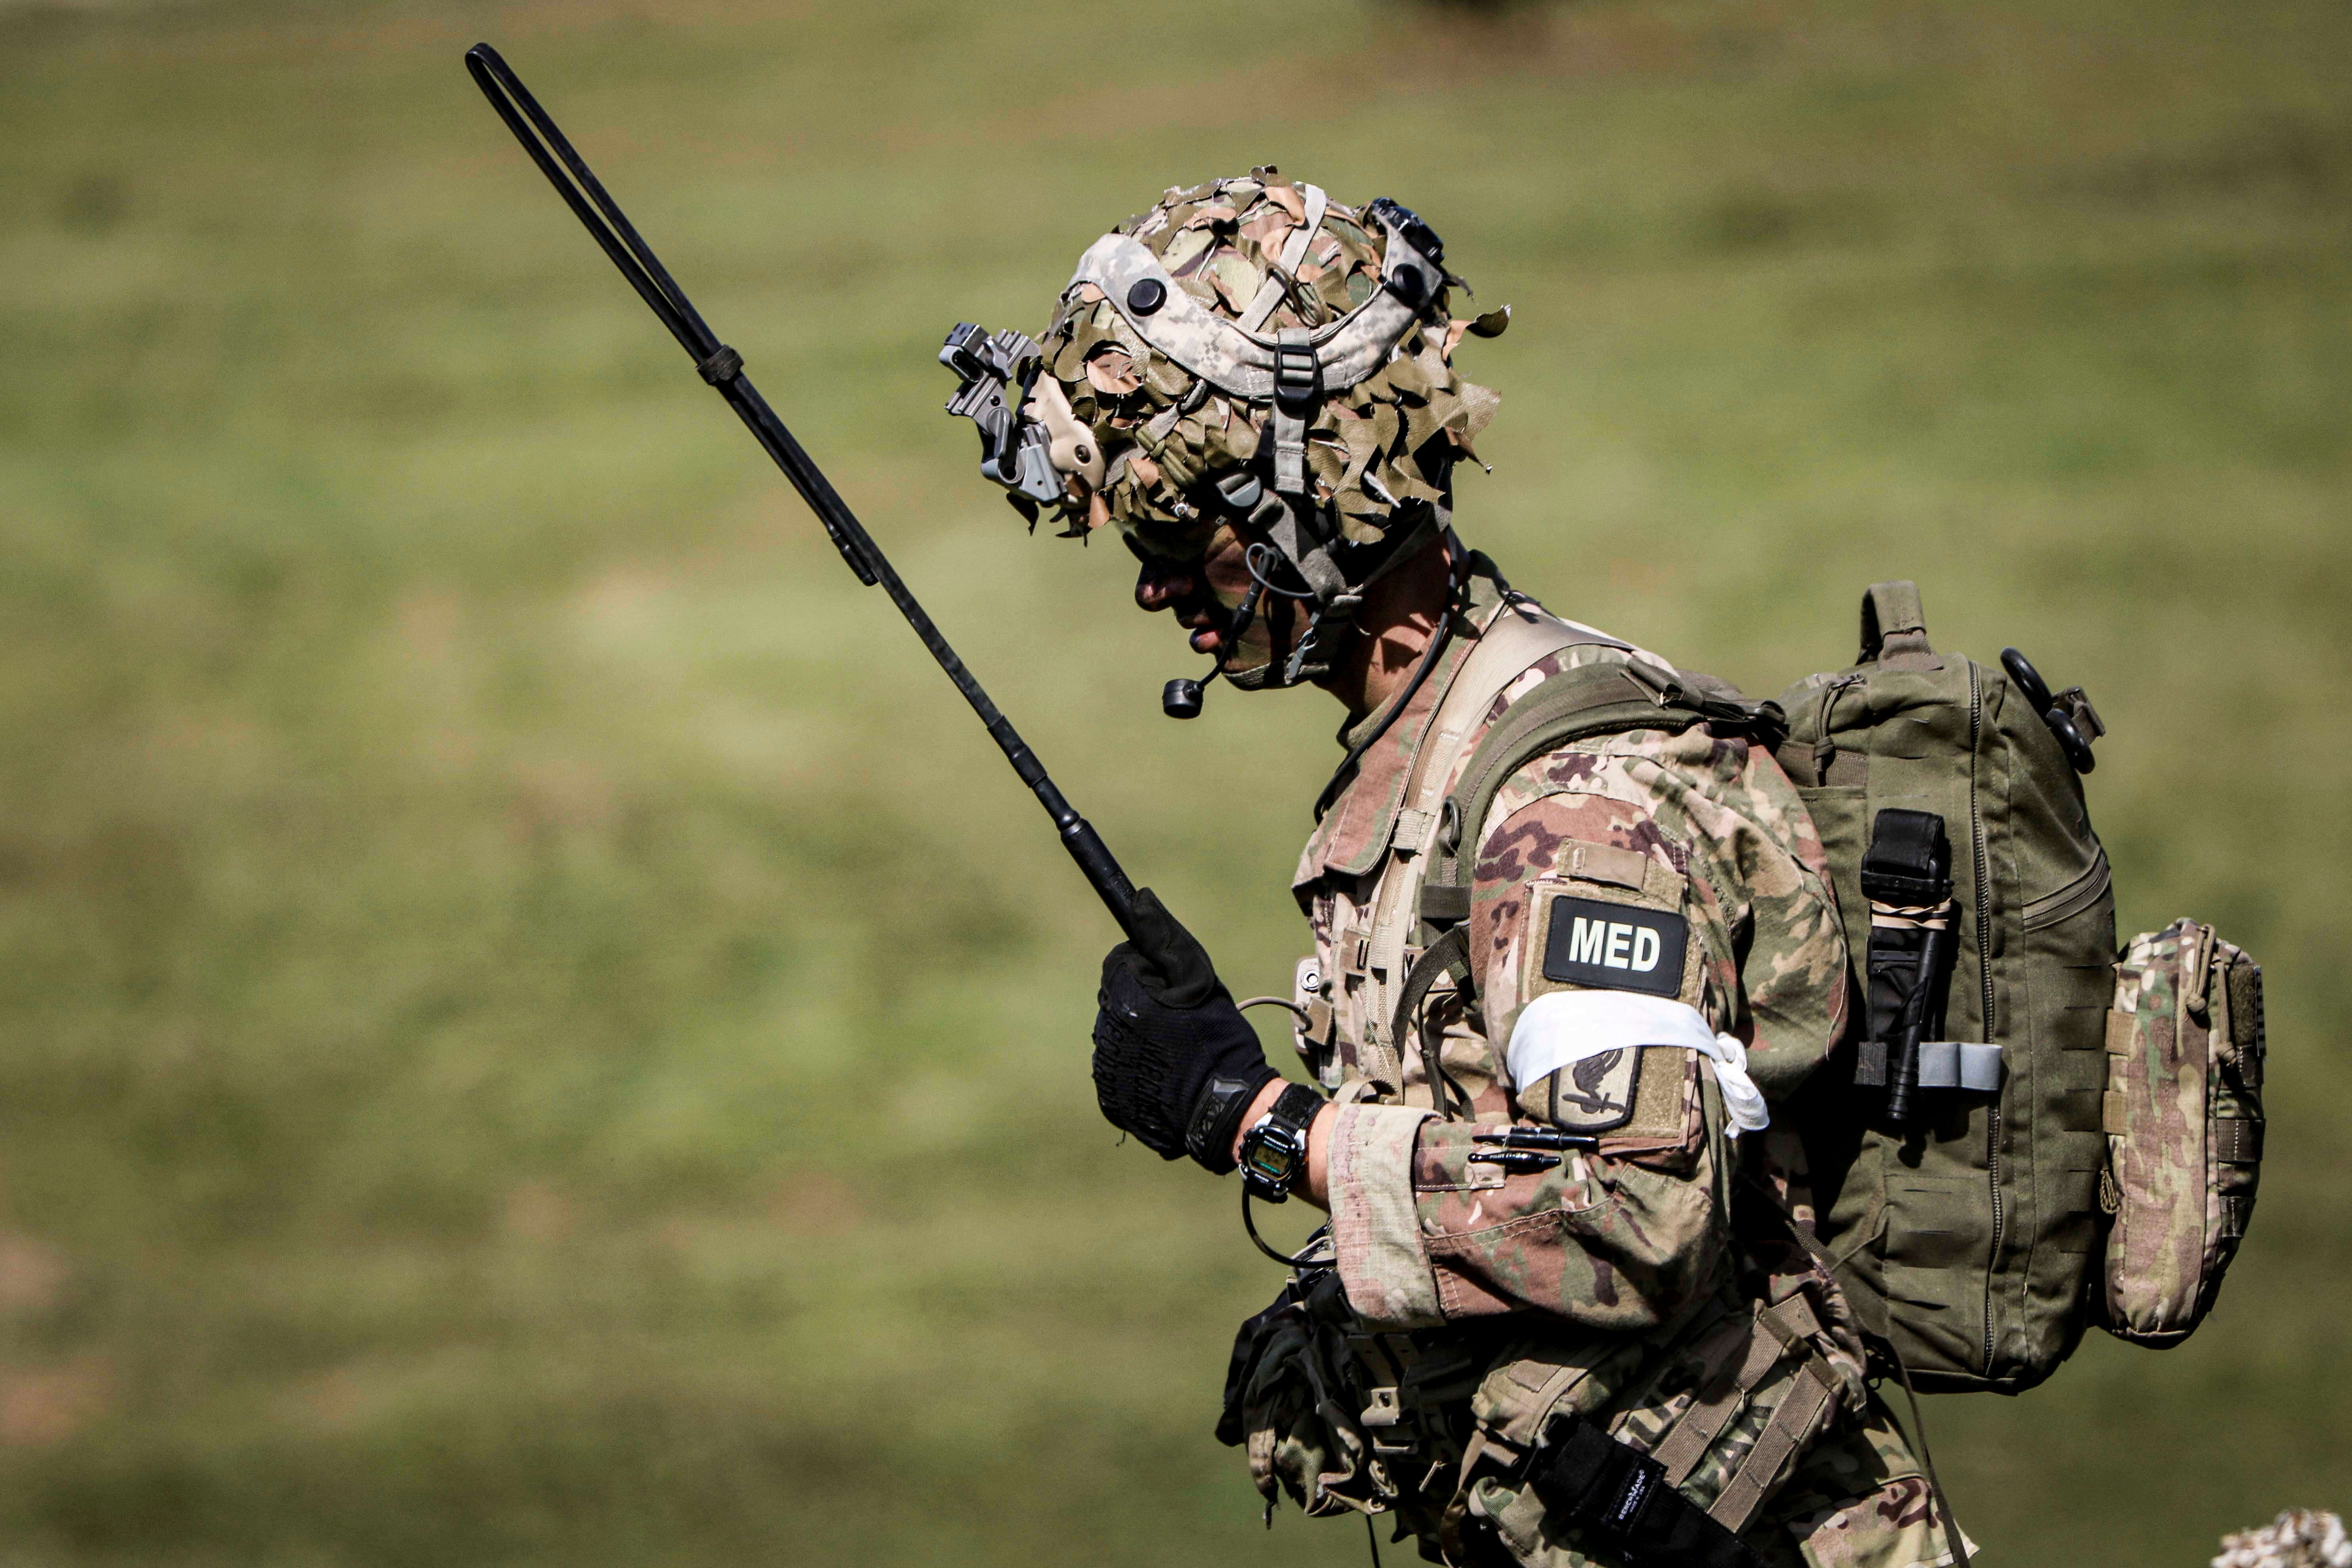 U.S. Army/ZUMAPRESS.com/Globallookpress